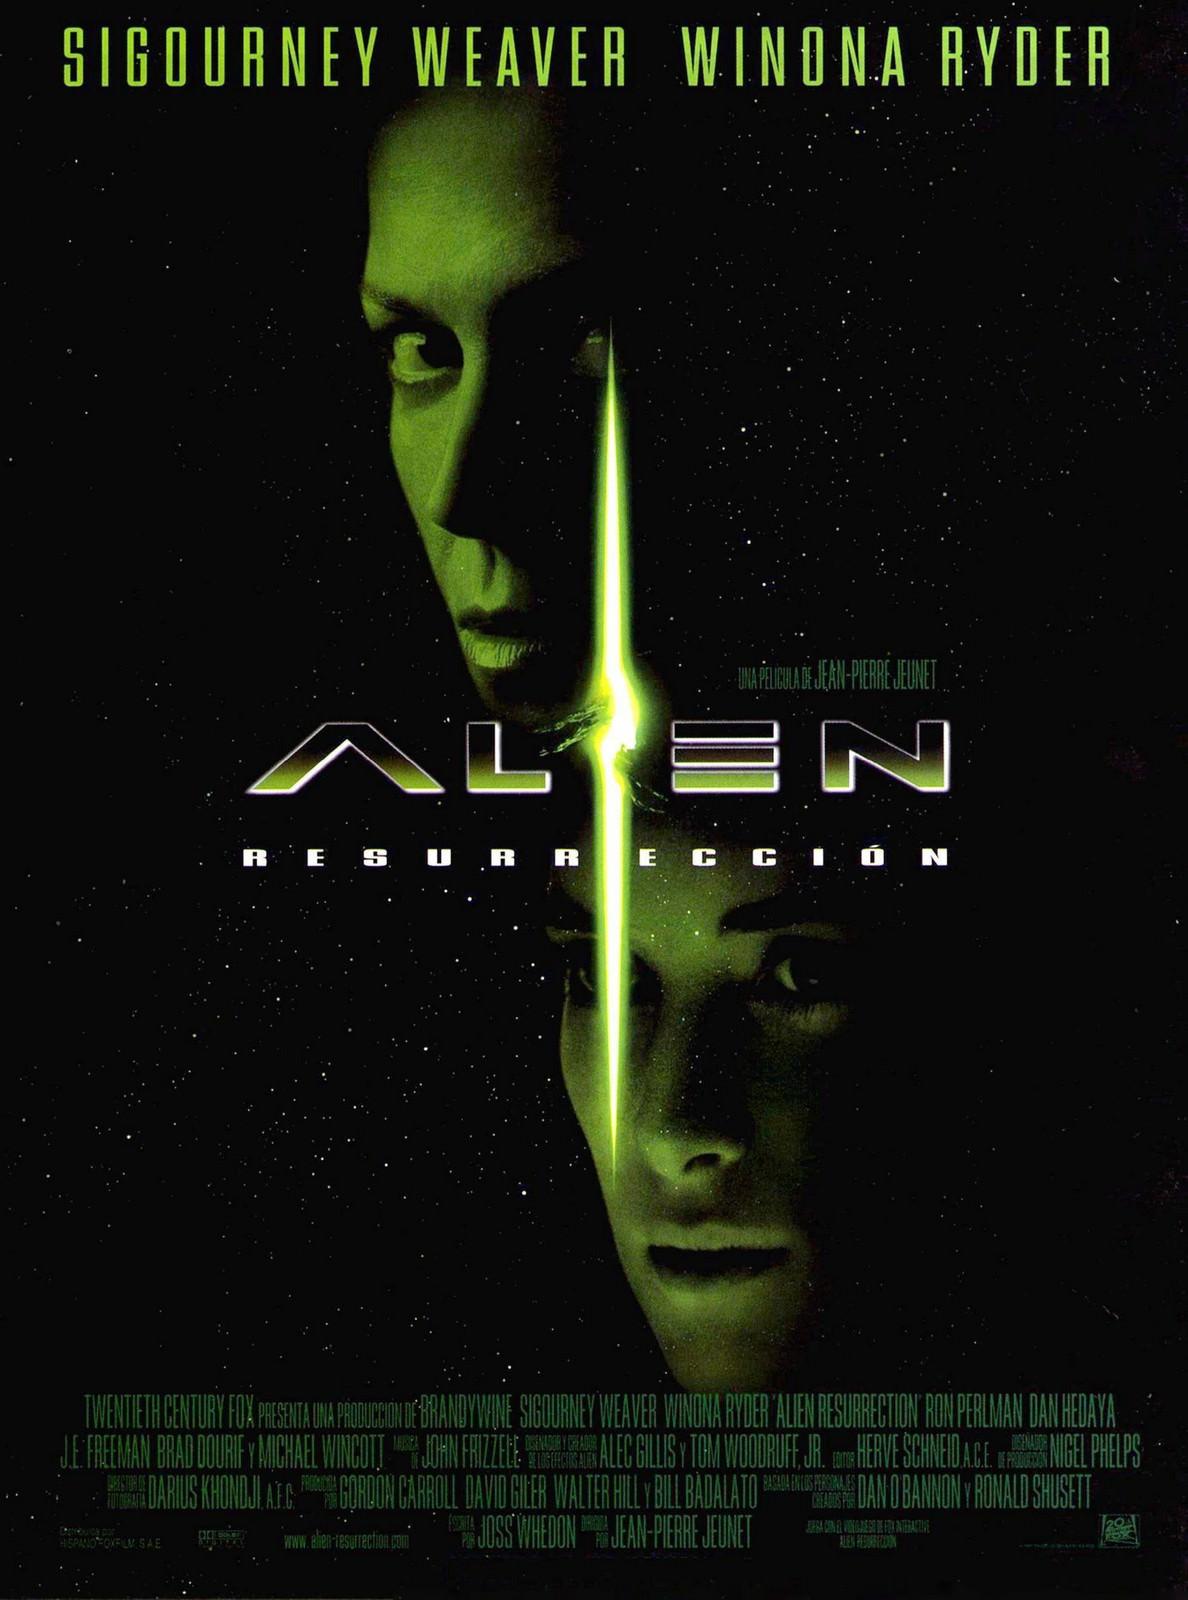 Movie, Alien: Resurrection(美國, 1997年) / 異形4:浴火重生(台灣) / 異形4之逆種(香港) / 异形4(網路), 電影海報, 美國